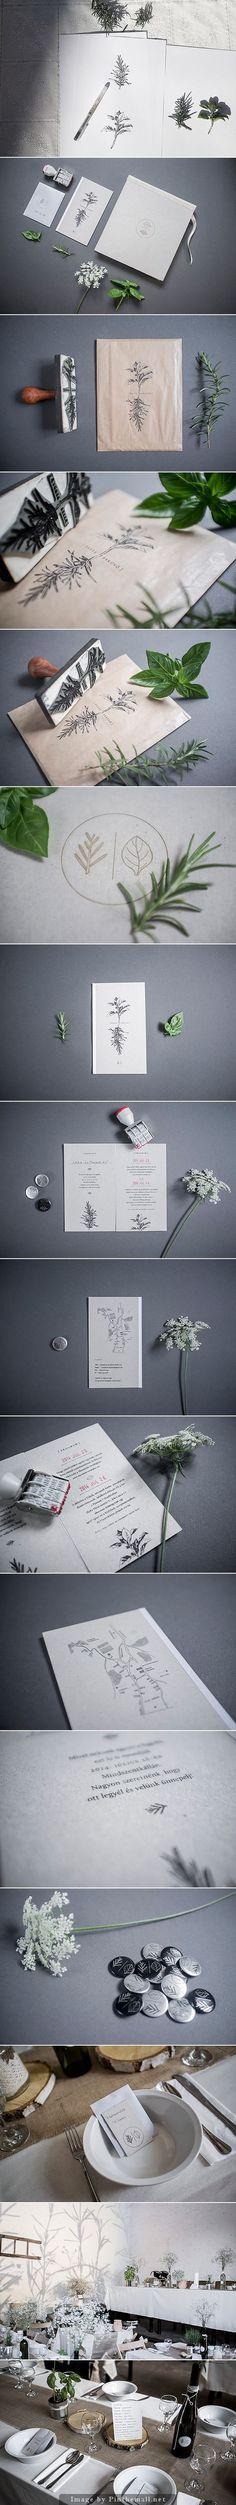 Zsofis wedding by Eszter Laki: